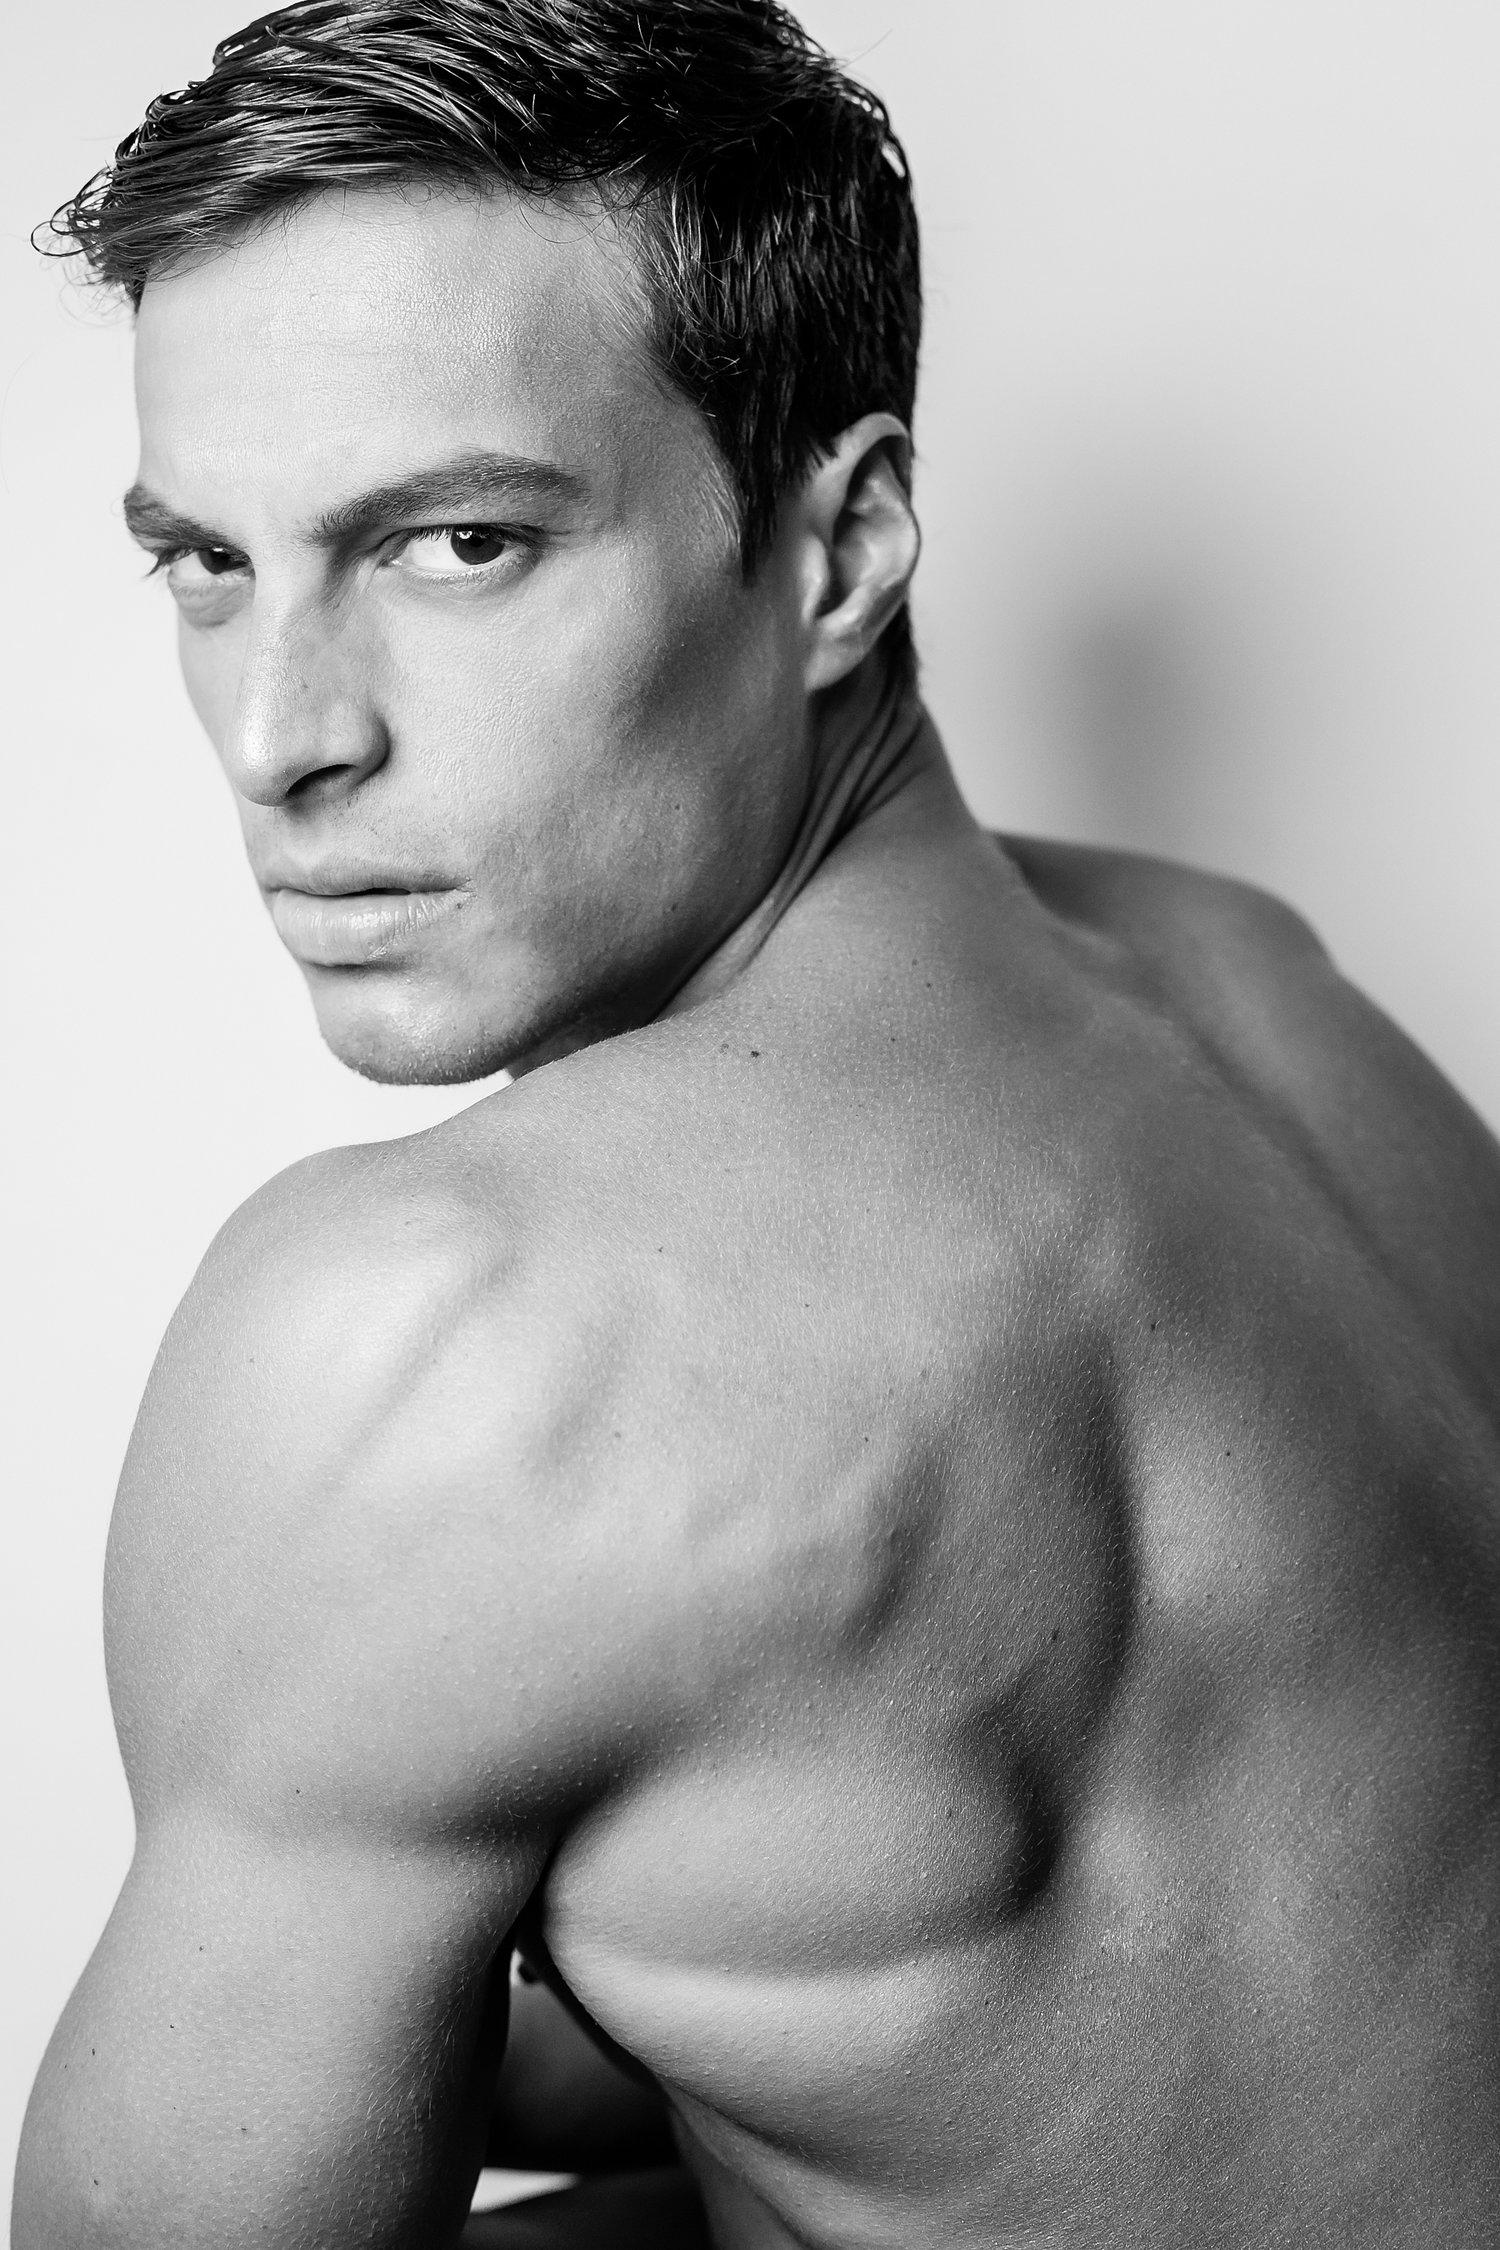 Adon Exclusive: Model Felipe Anibal By Thiago Martini